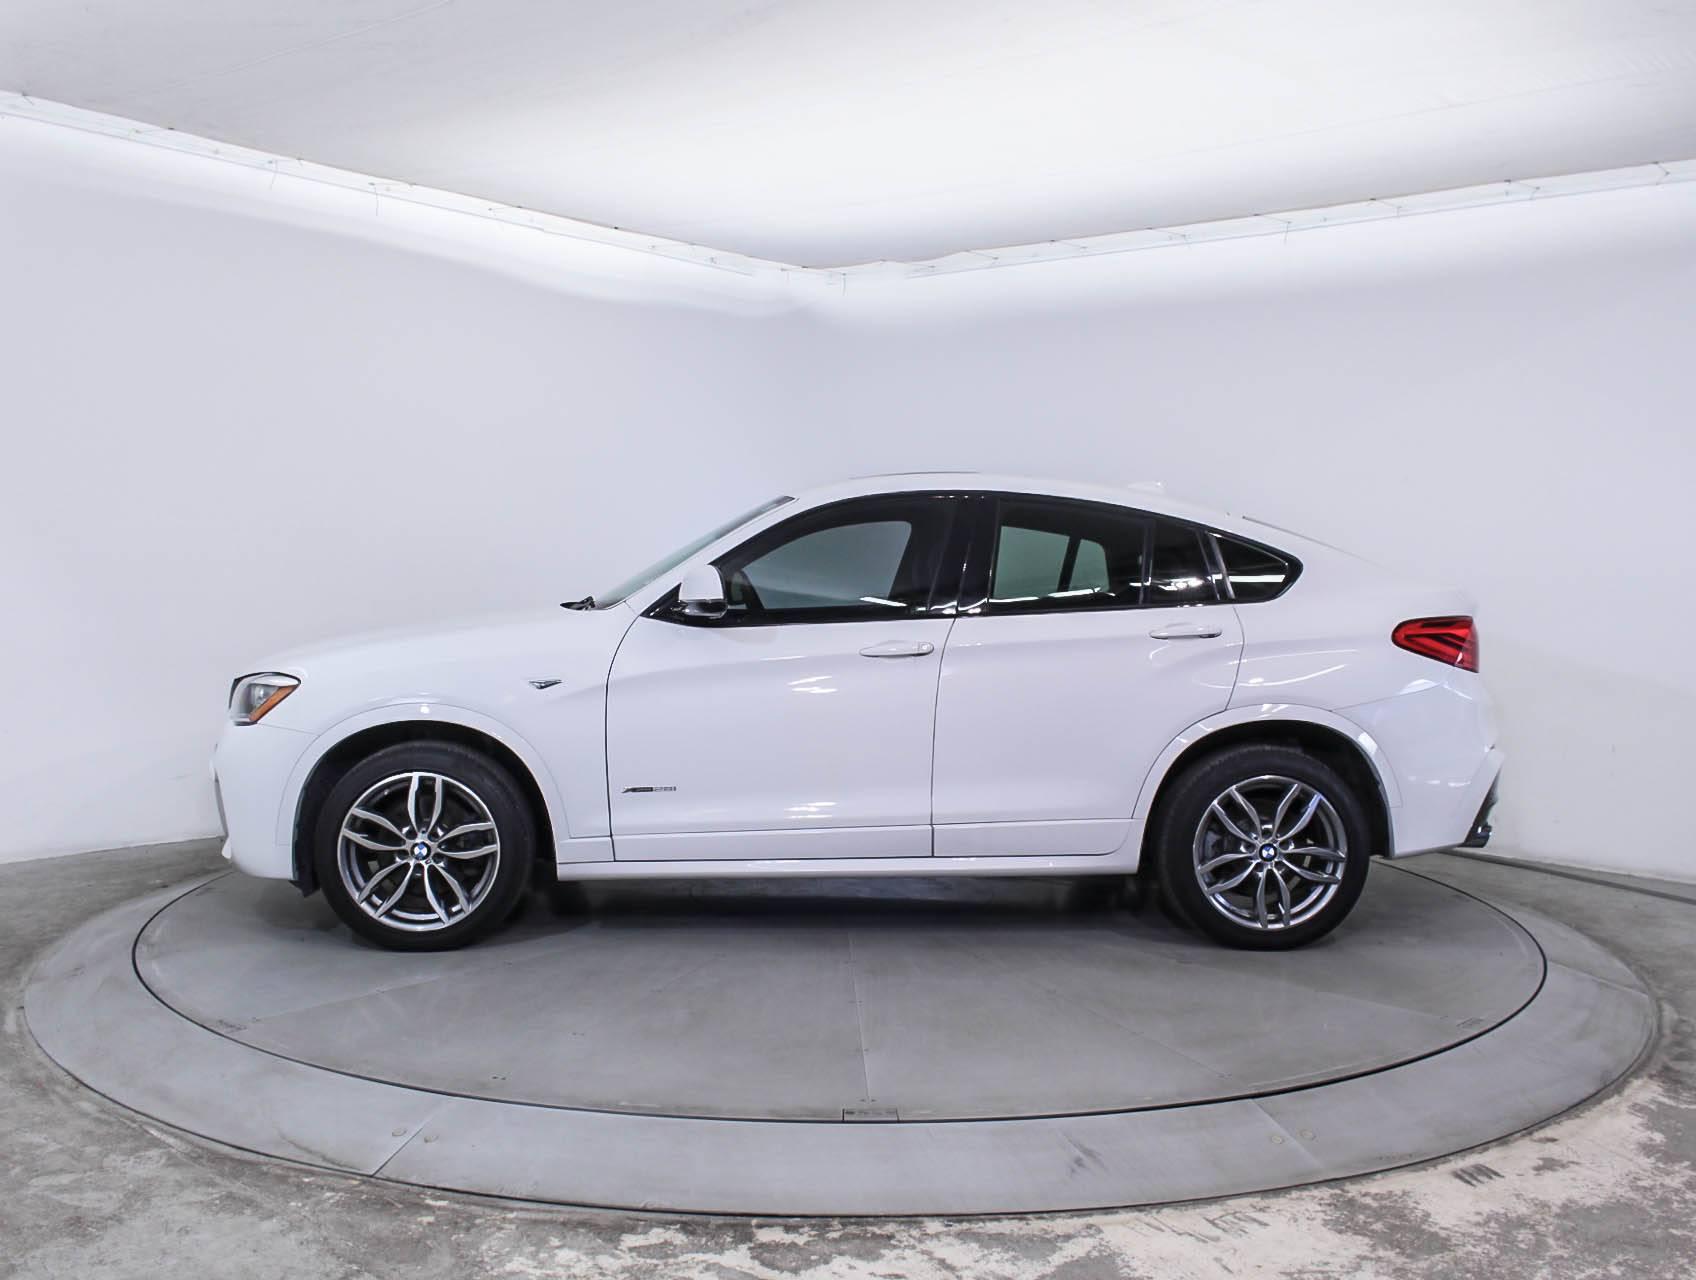 Used 2016 BMW X4 XDRIVE28I SUV for sale in MIAMI FL